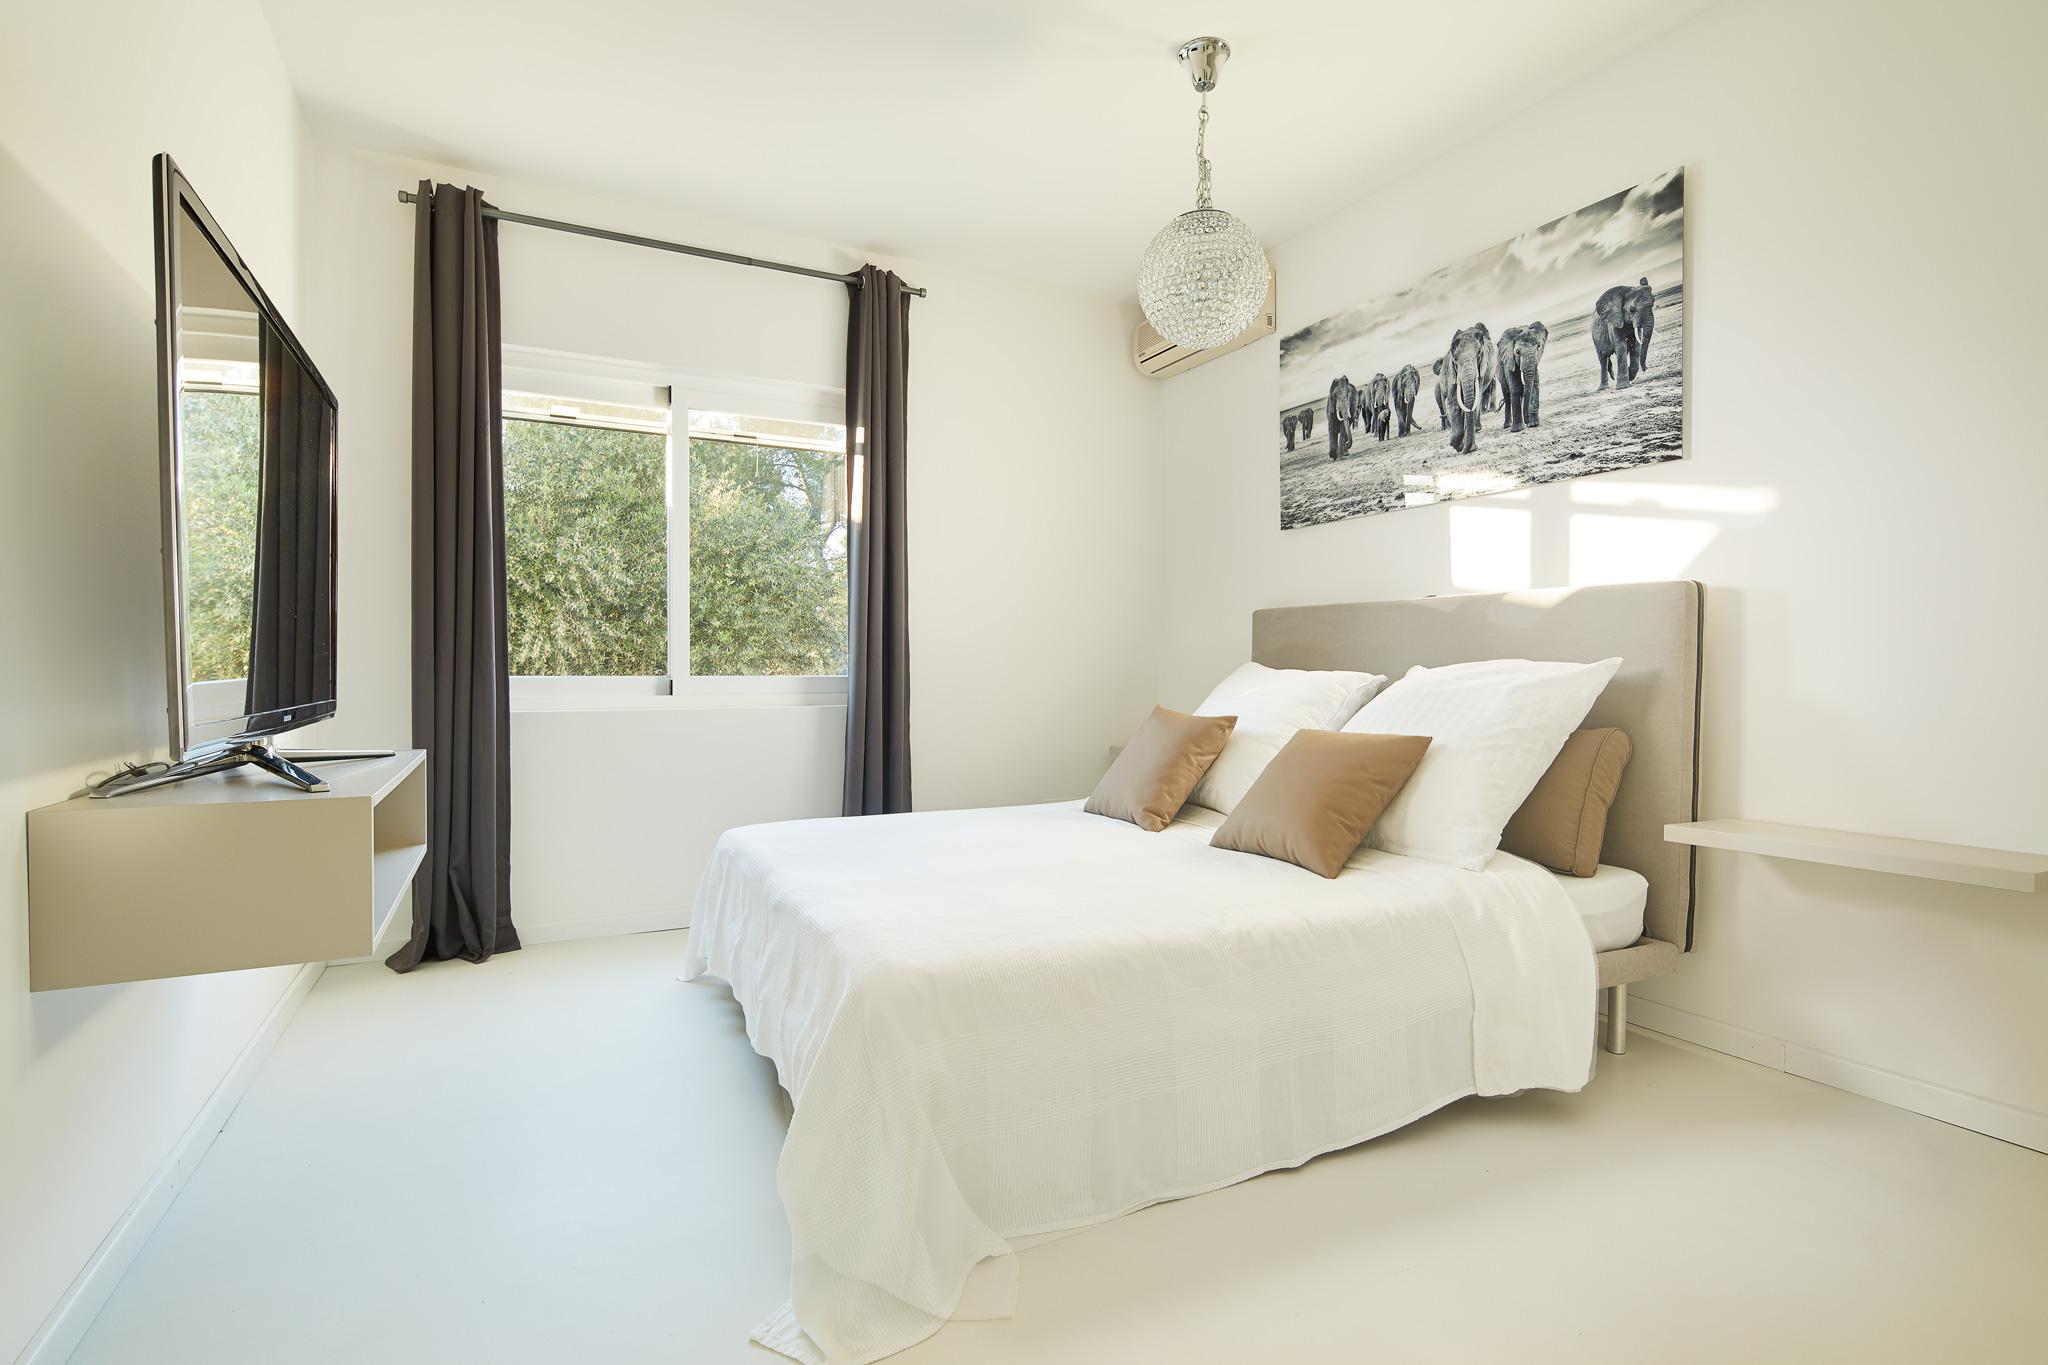 Bedroom_3.1.jpg